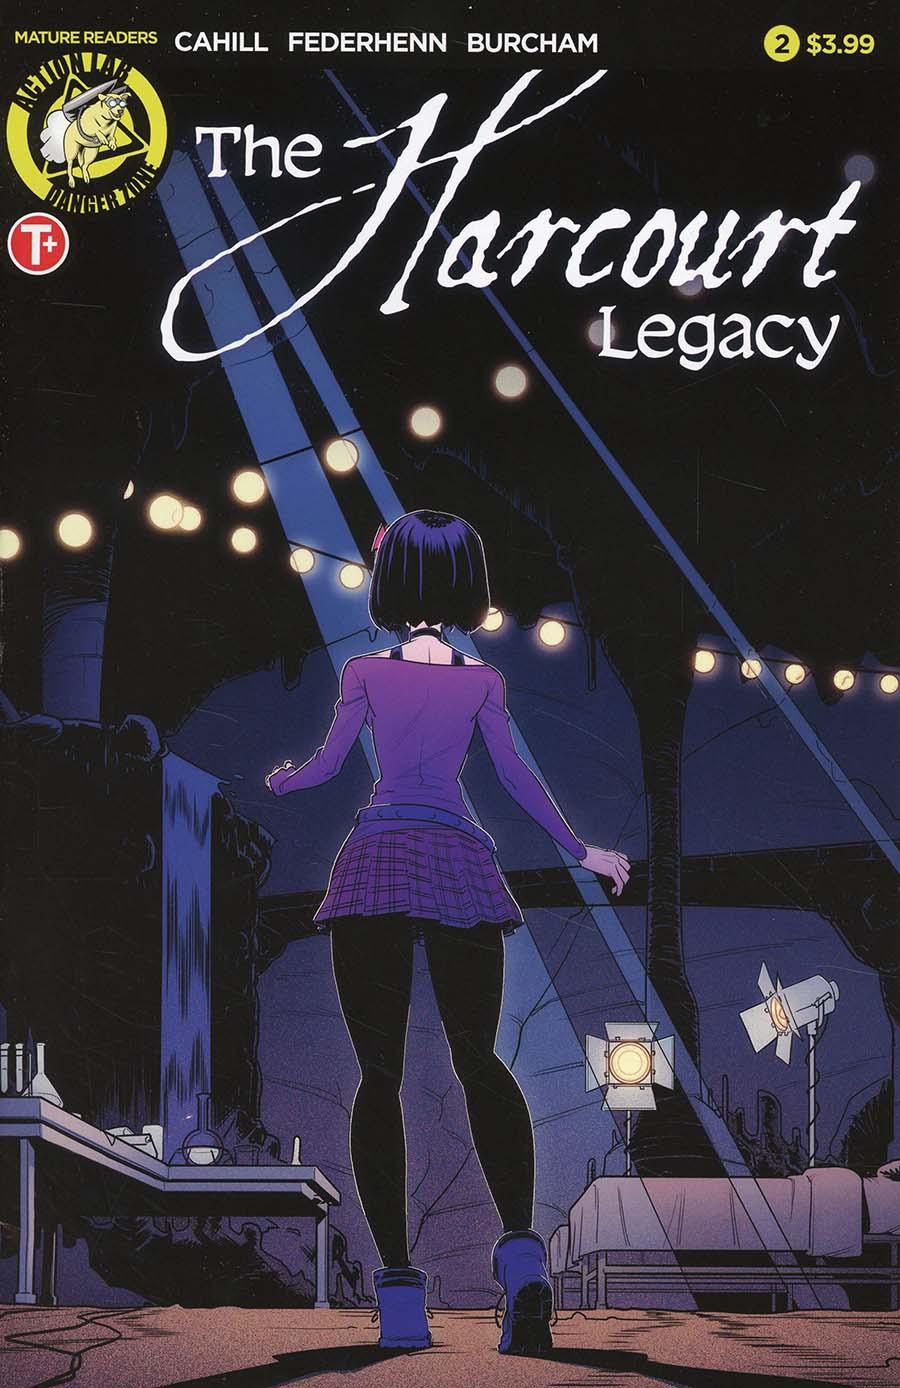 Harcourt Legacy #2 Cover A Regular Jason Federhenn Cover